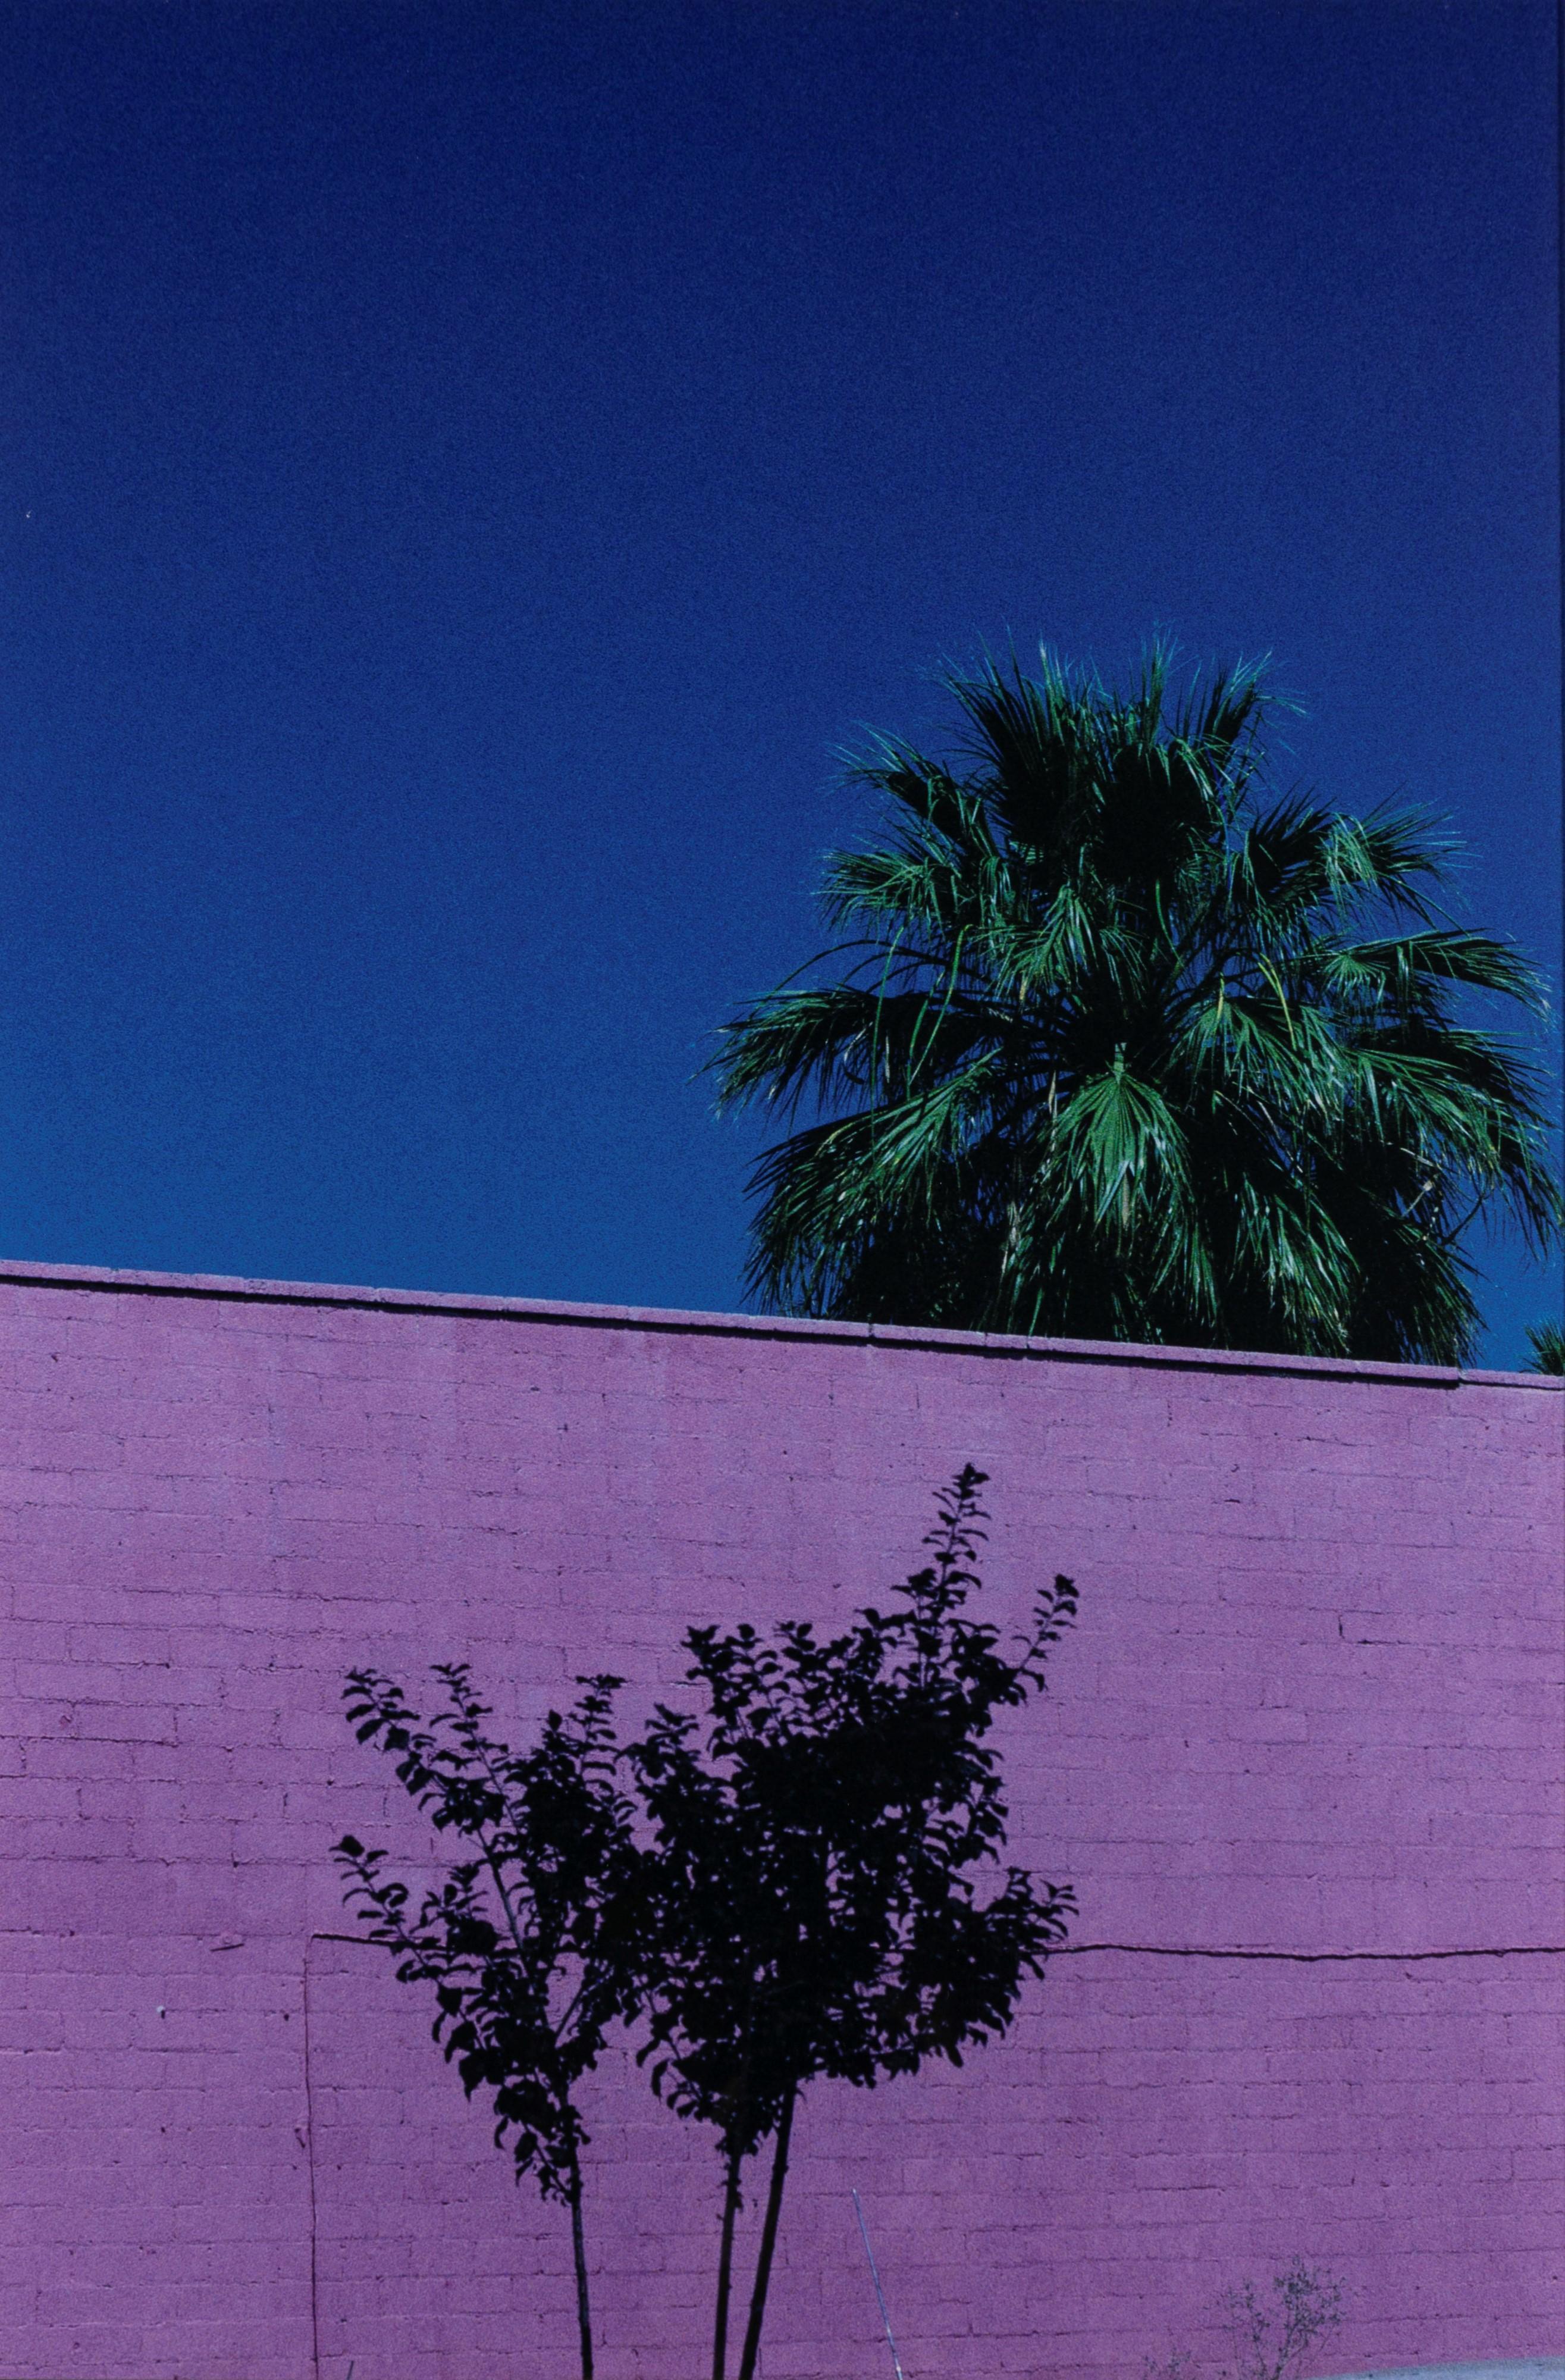 Paesaggio Urbano, Phoenix - Arizona